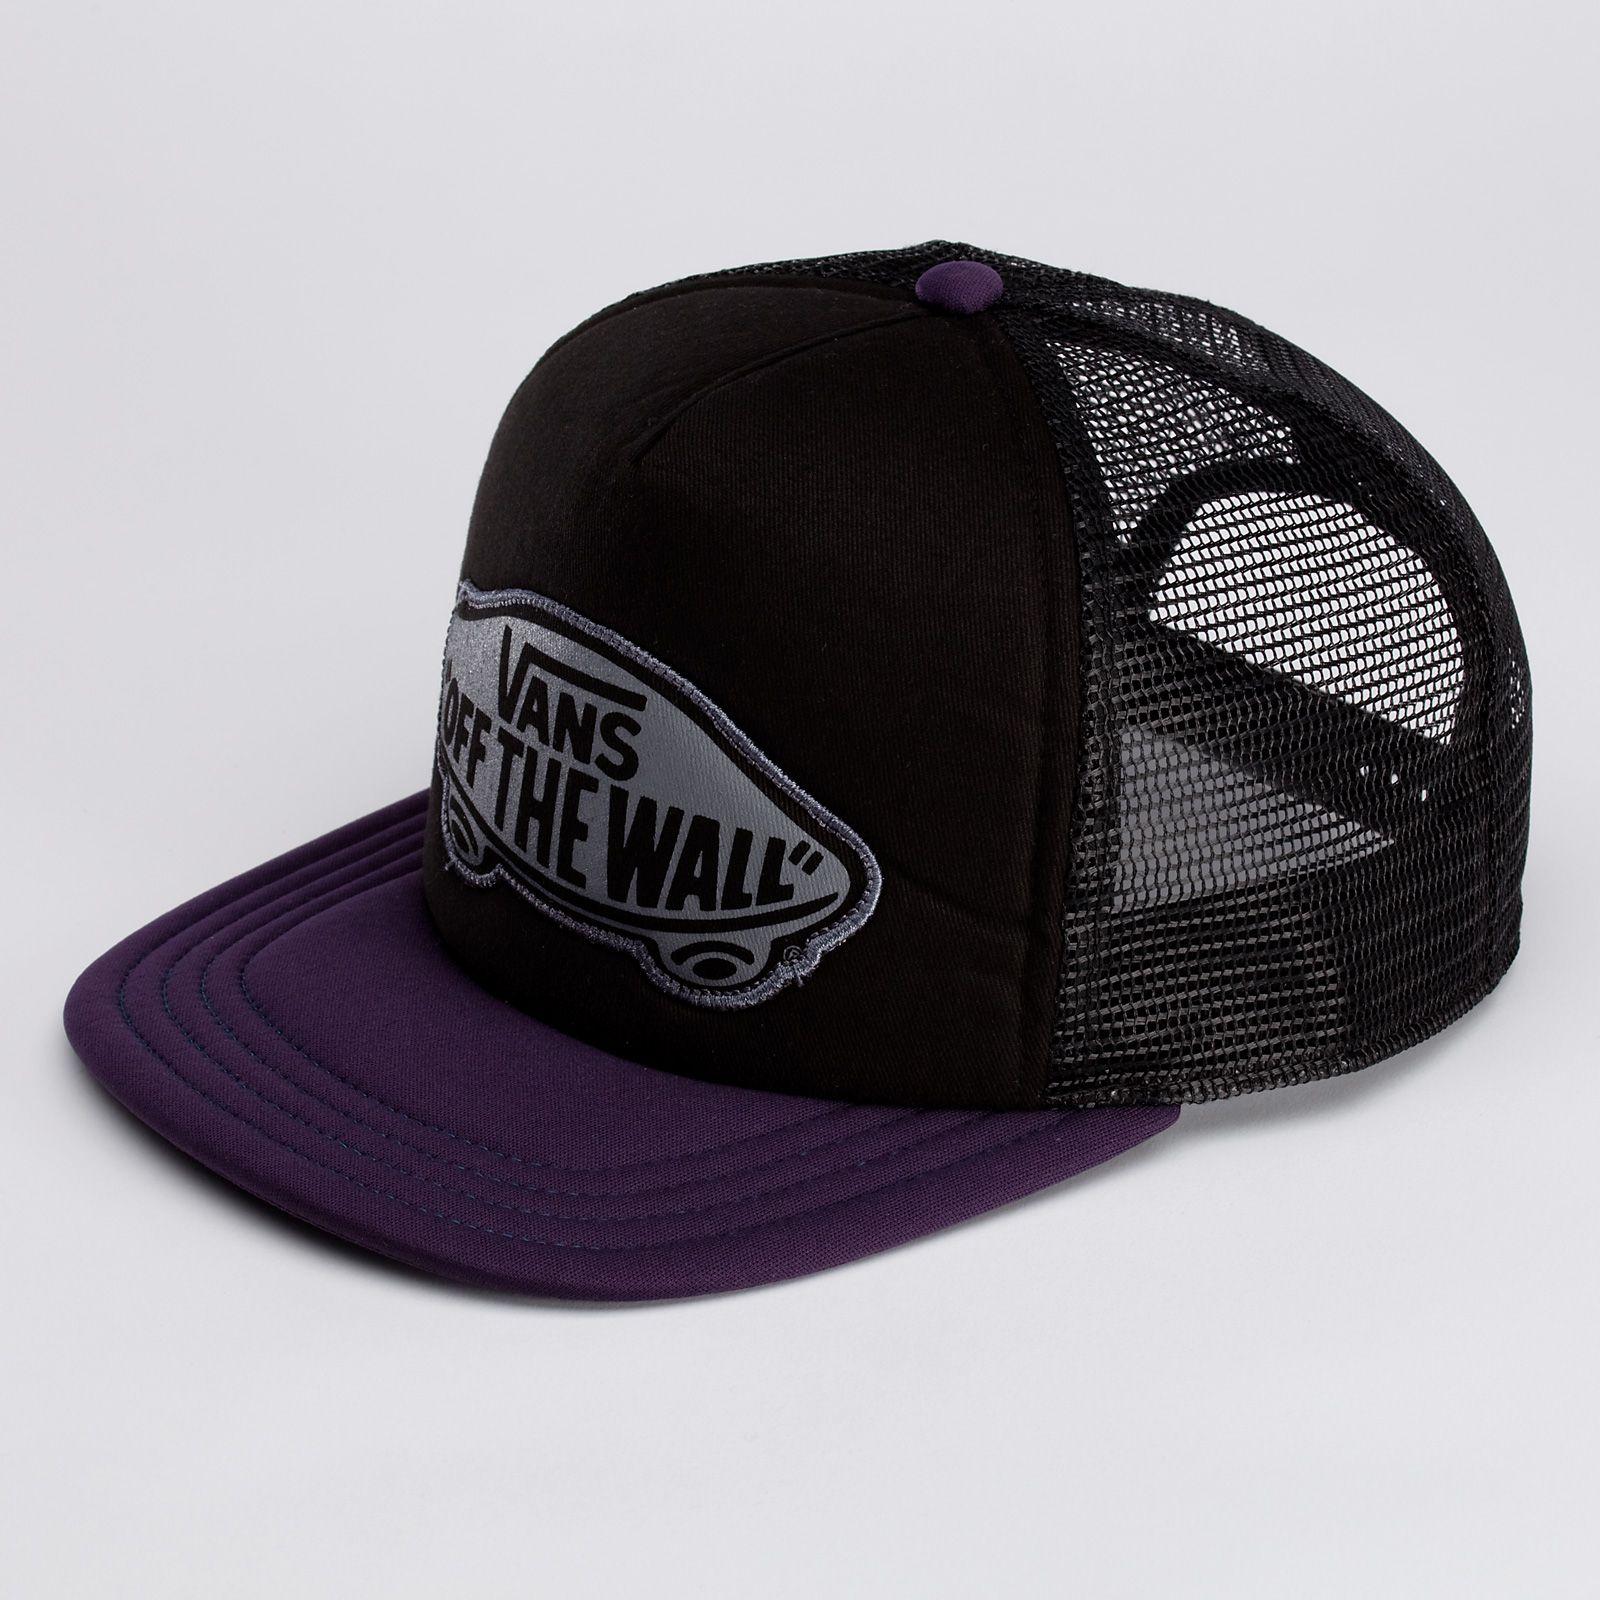 1ae426d53f Vans Labor Trucker Snapback Hat (Black)  19.95